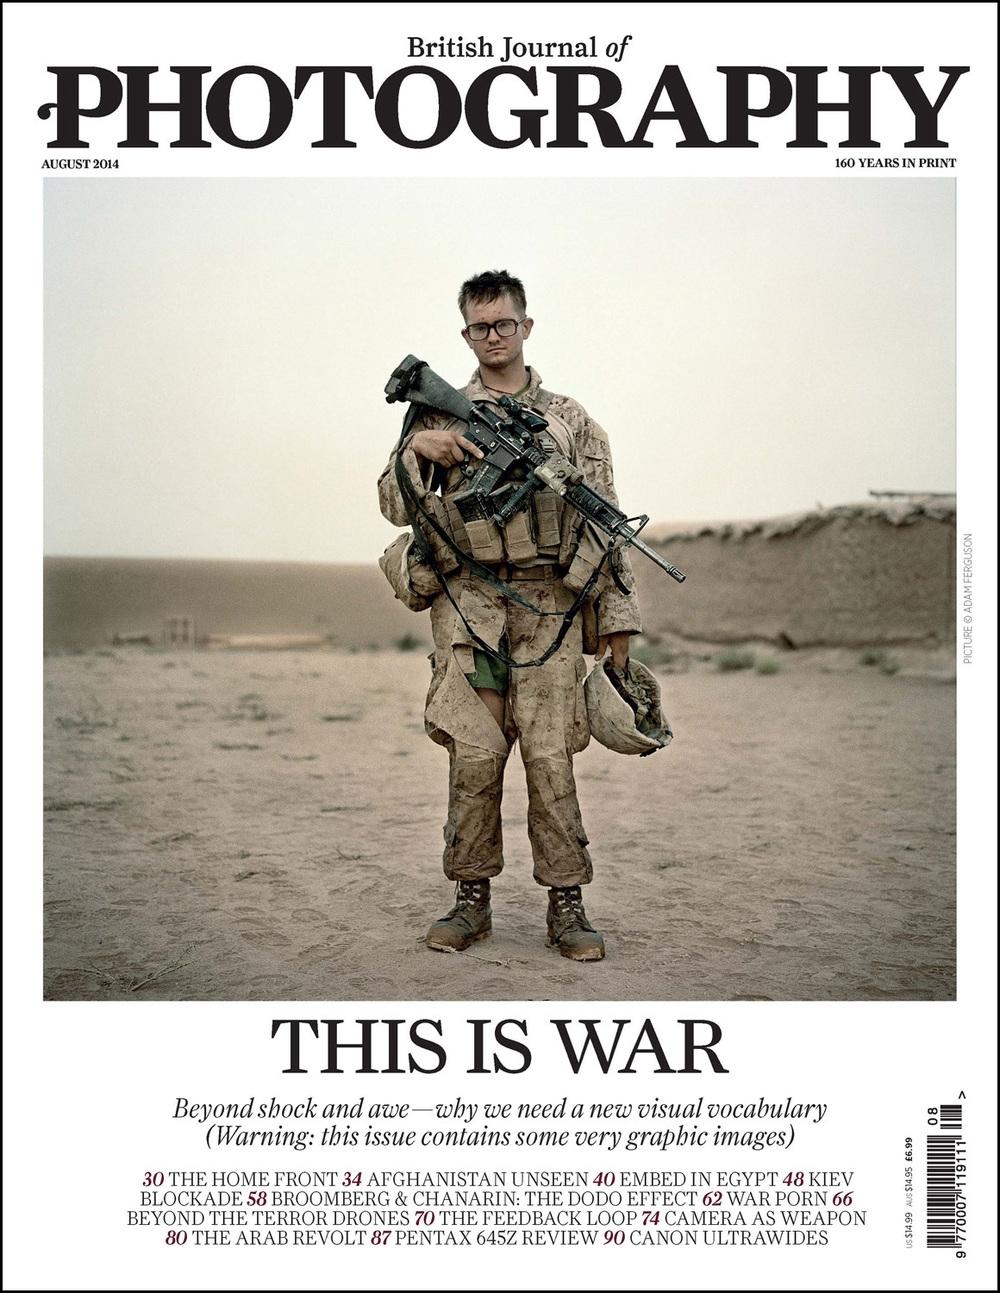 [photo] [editorial] [magazine] [design] BJP_Cover_Aug20014_1500PX